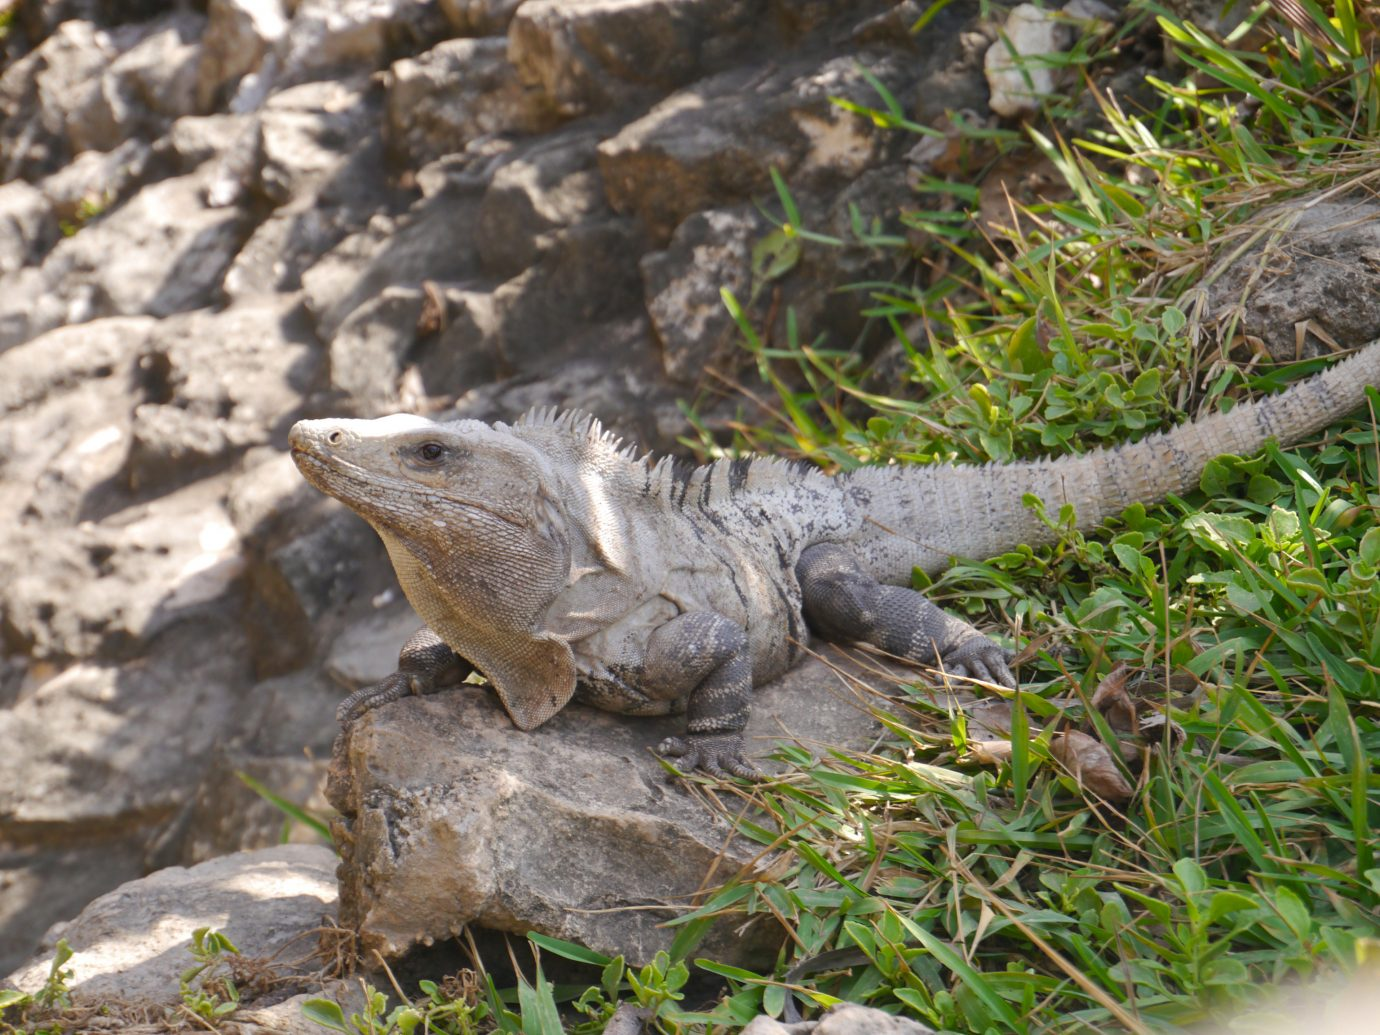 City Mexico Trip Ideas Tulum animal outdoor rock reptile iguana fauna scaled reptile iguania lizard alligator organism crocodilia grass tree american alligator terrestrial animal agamidae crocodile trunk